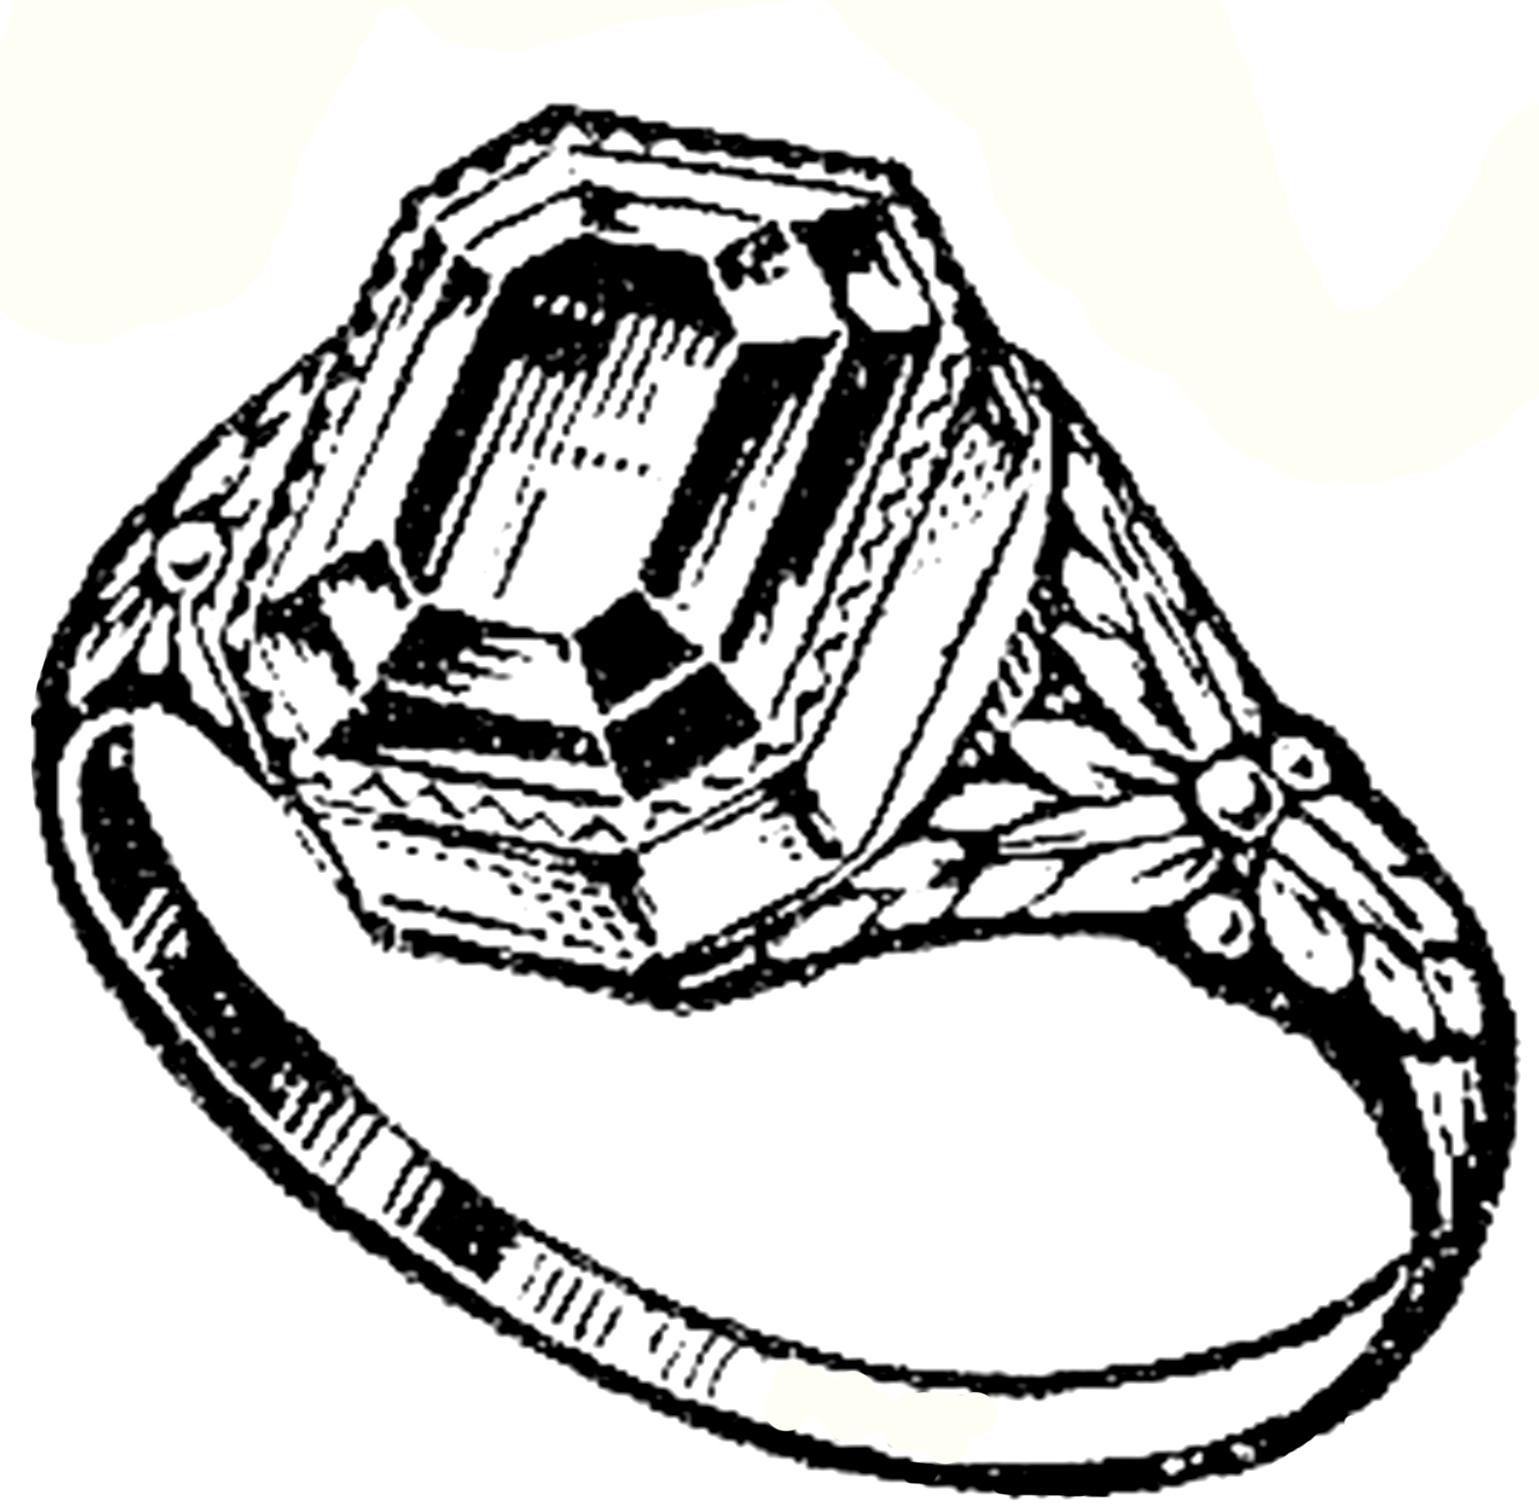 Antique Ring Image